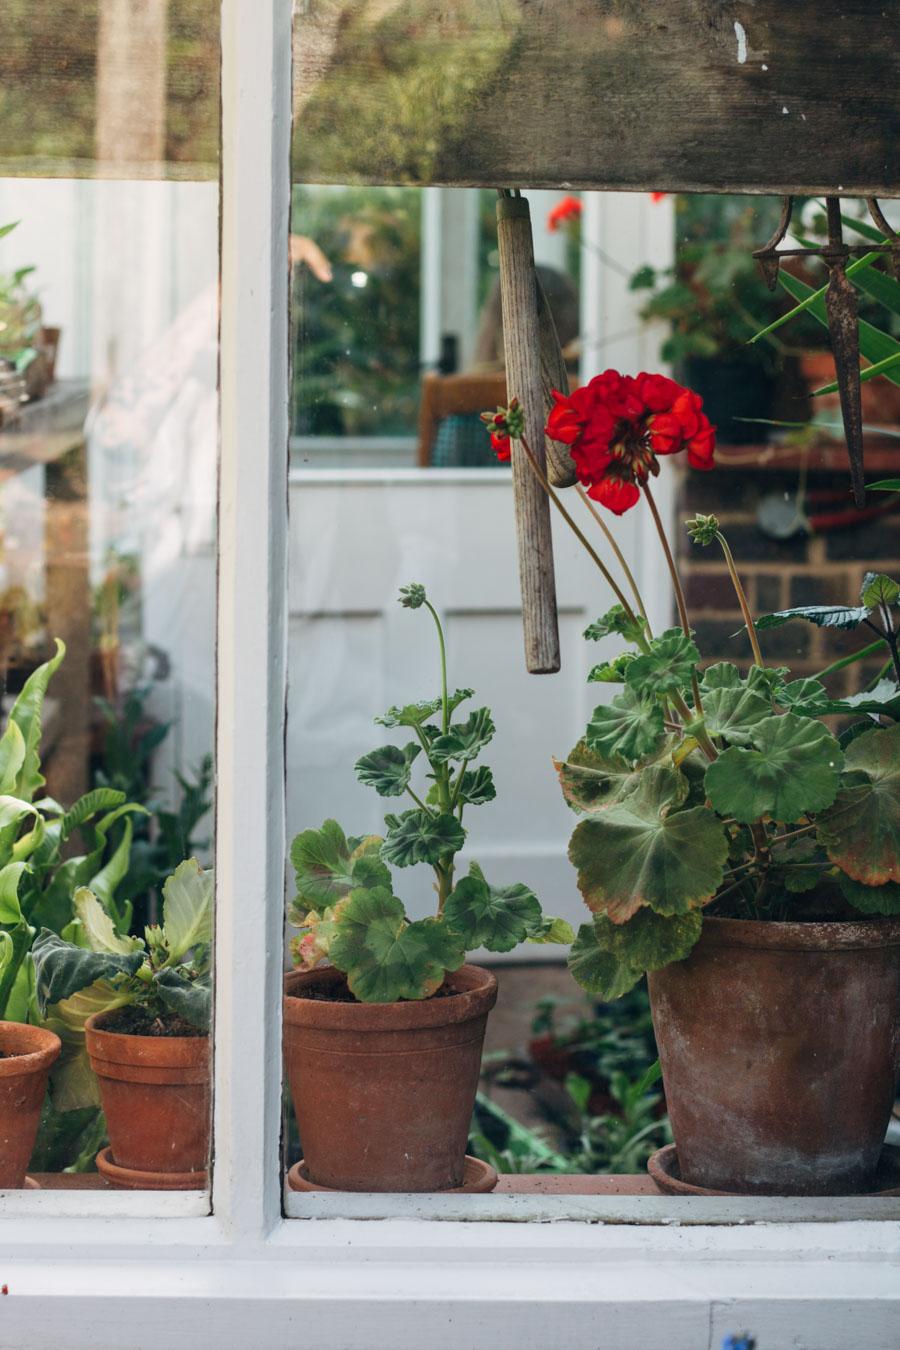 Virginia and Leonard Woolf's garden - Monks House